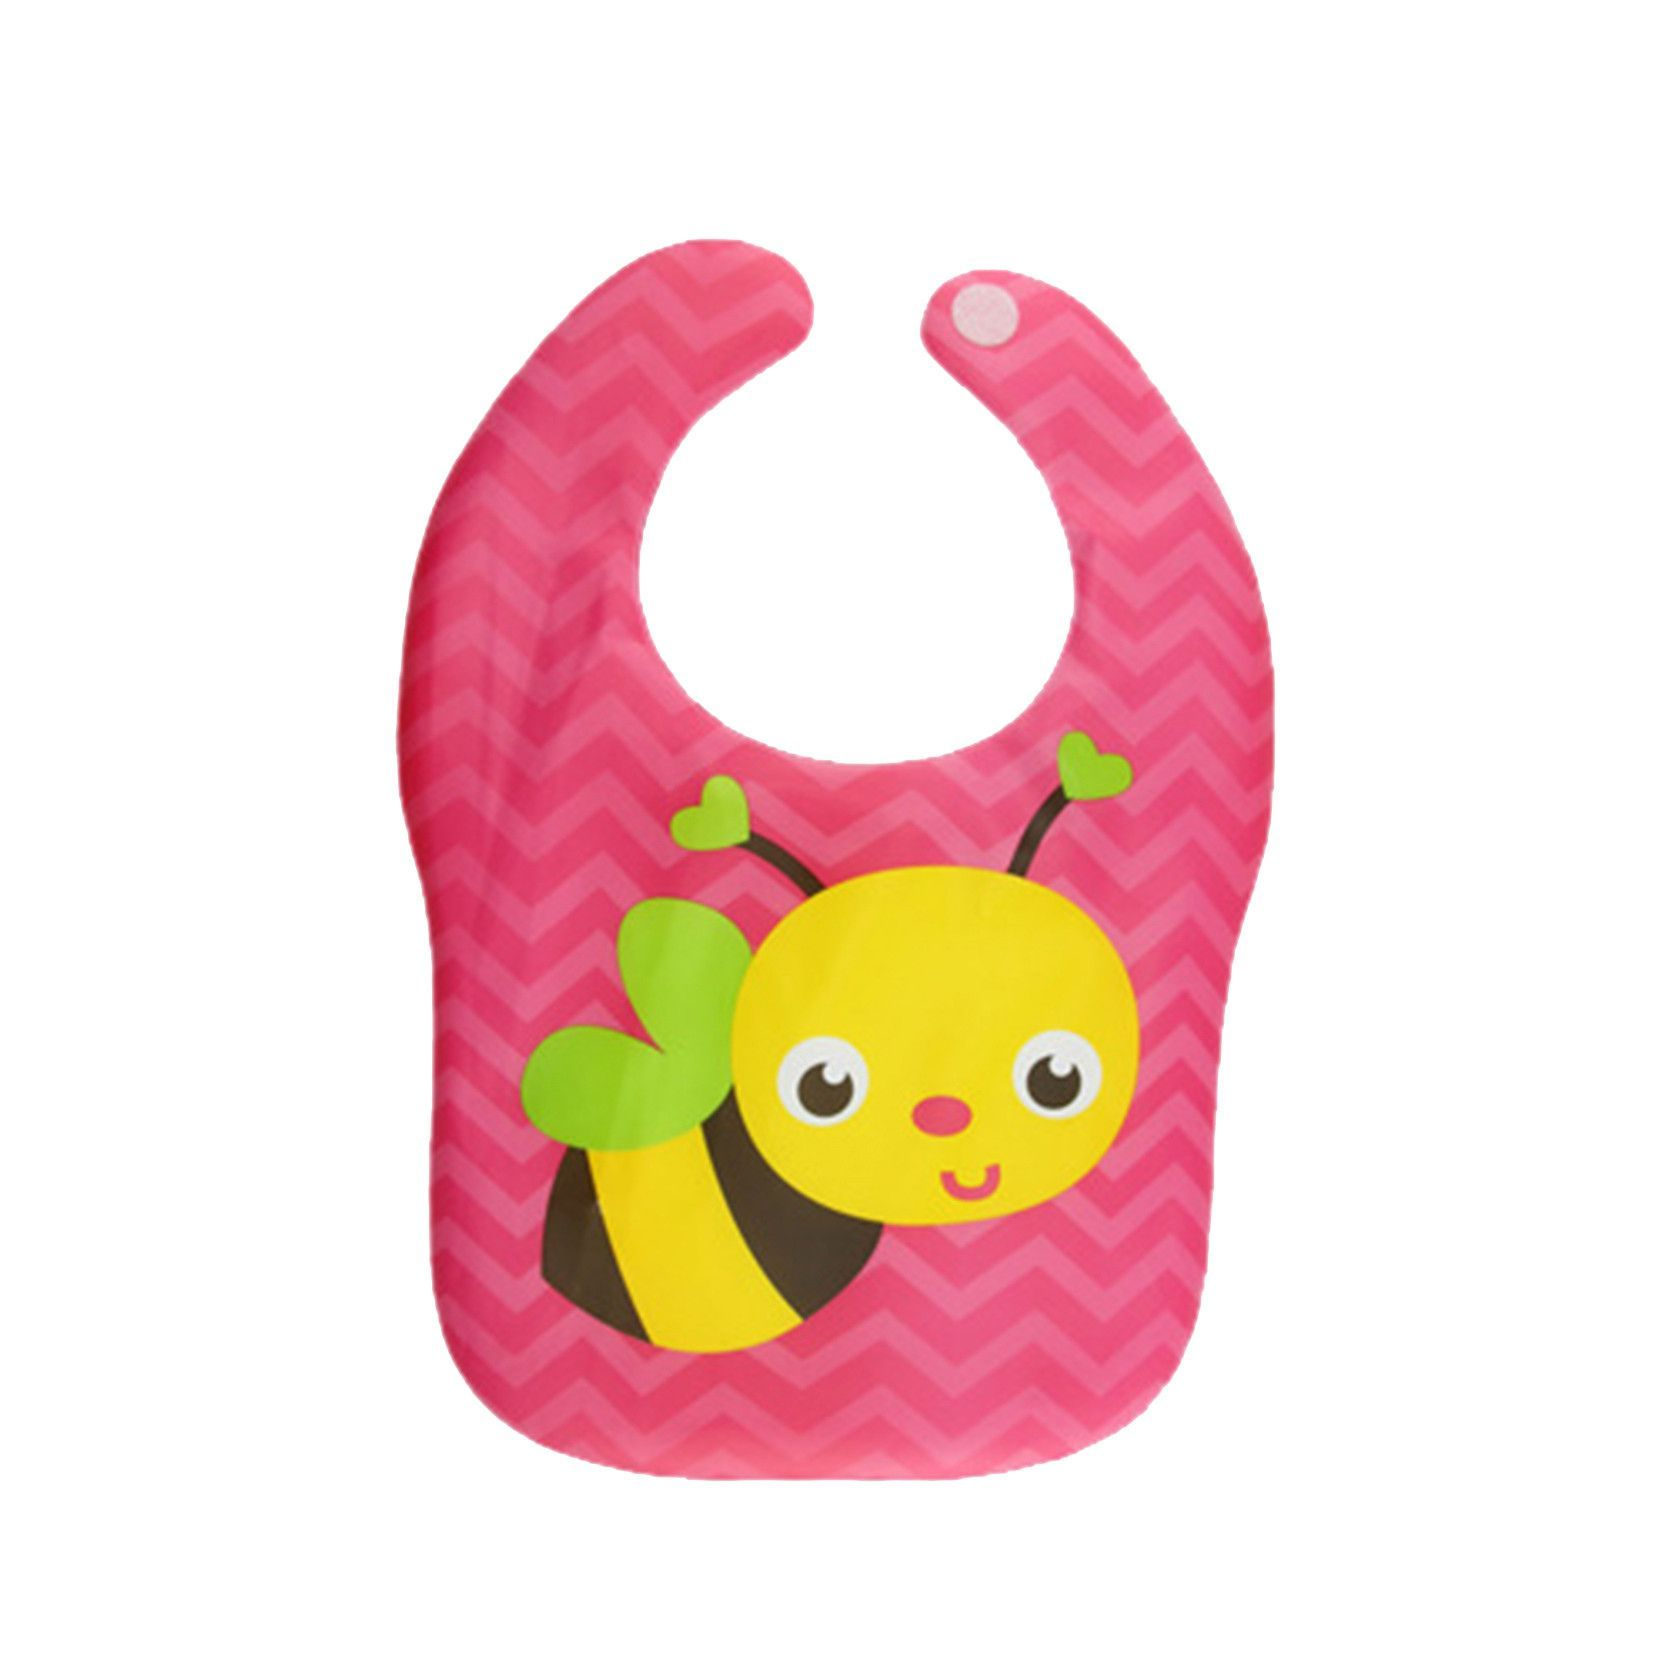 Cute Animal Baby Bibs Waterproof Cartoon Bee Bear Dinosaur Pattern Infant Burp Cloths Baby Boy Girl Clothing Accessories